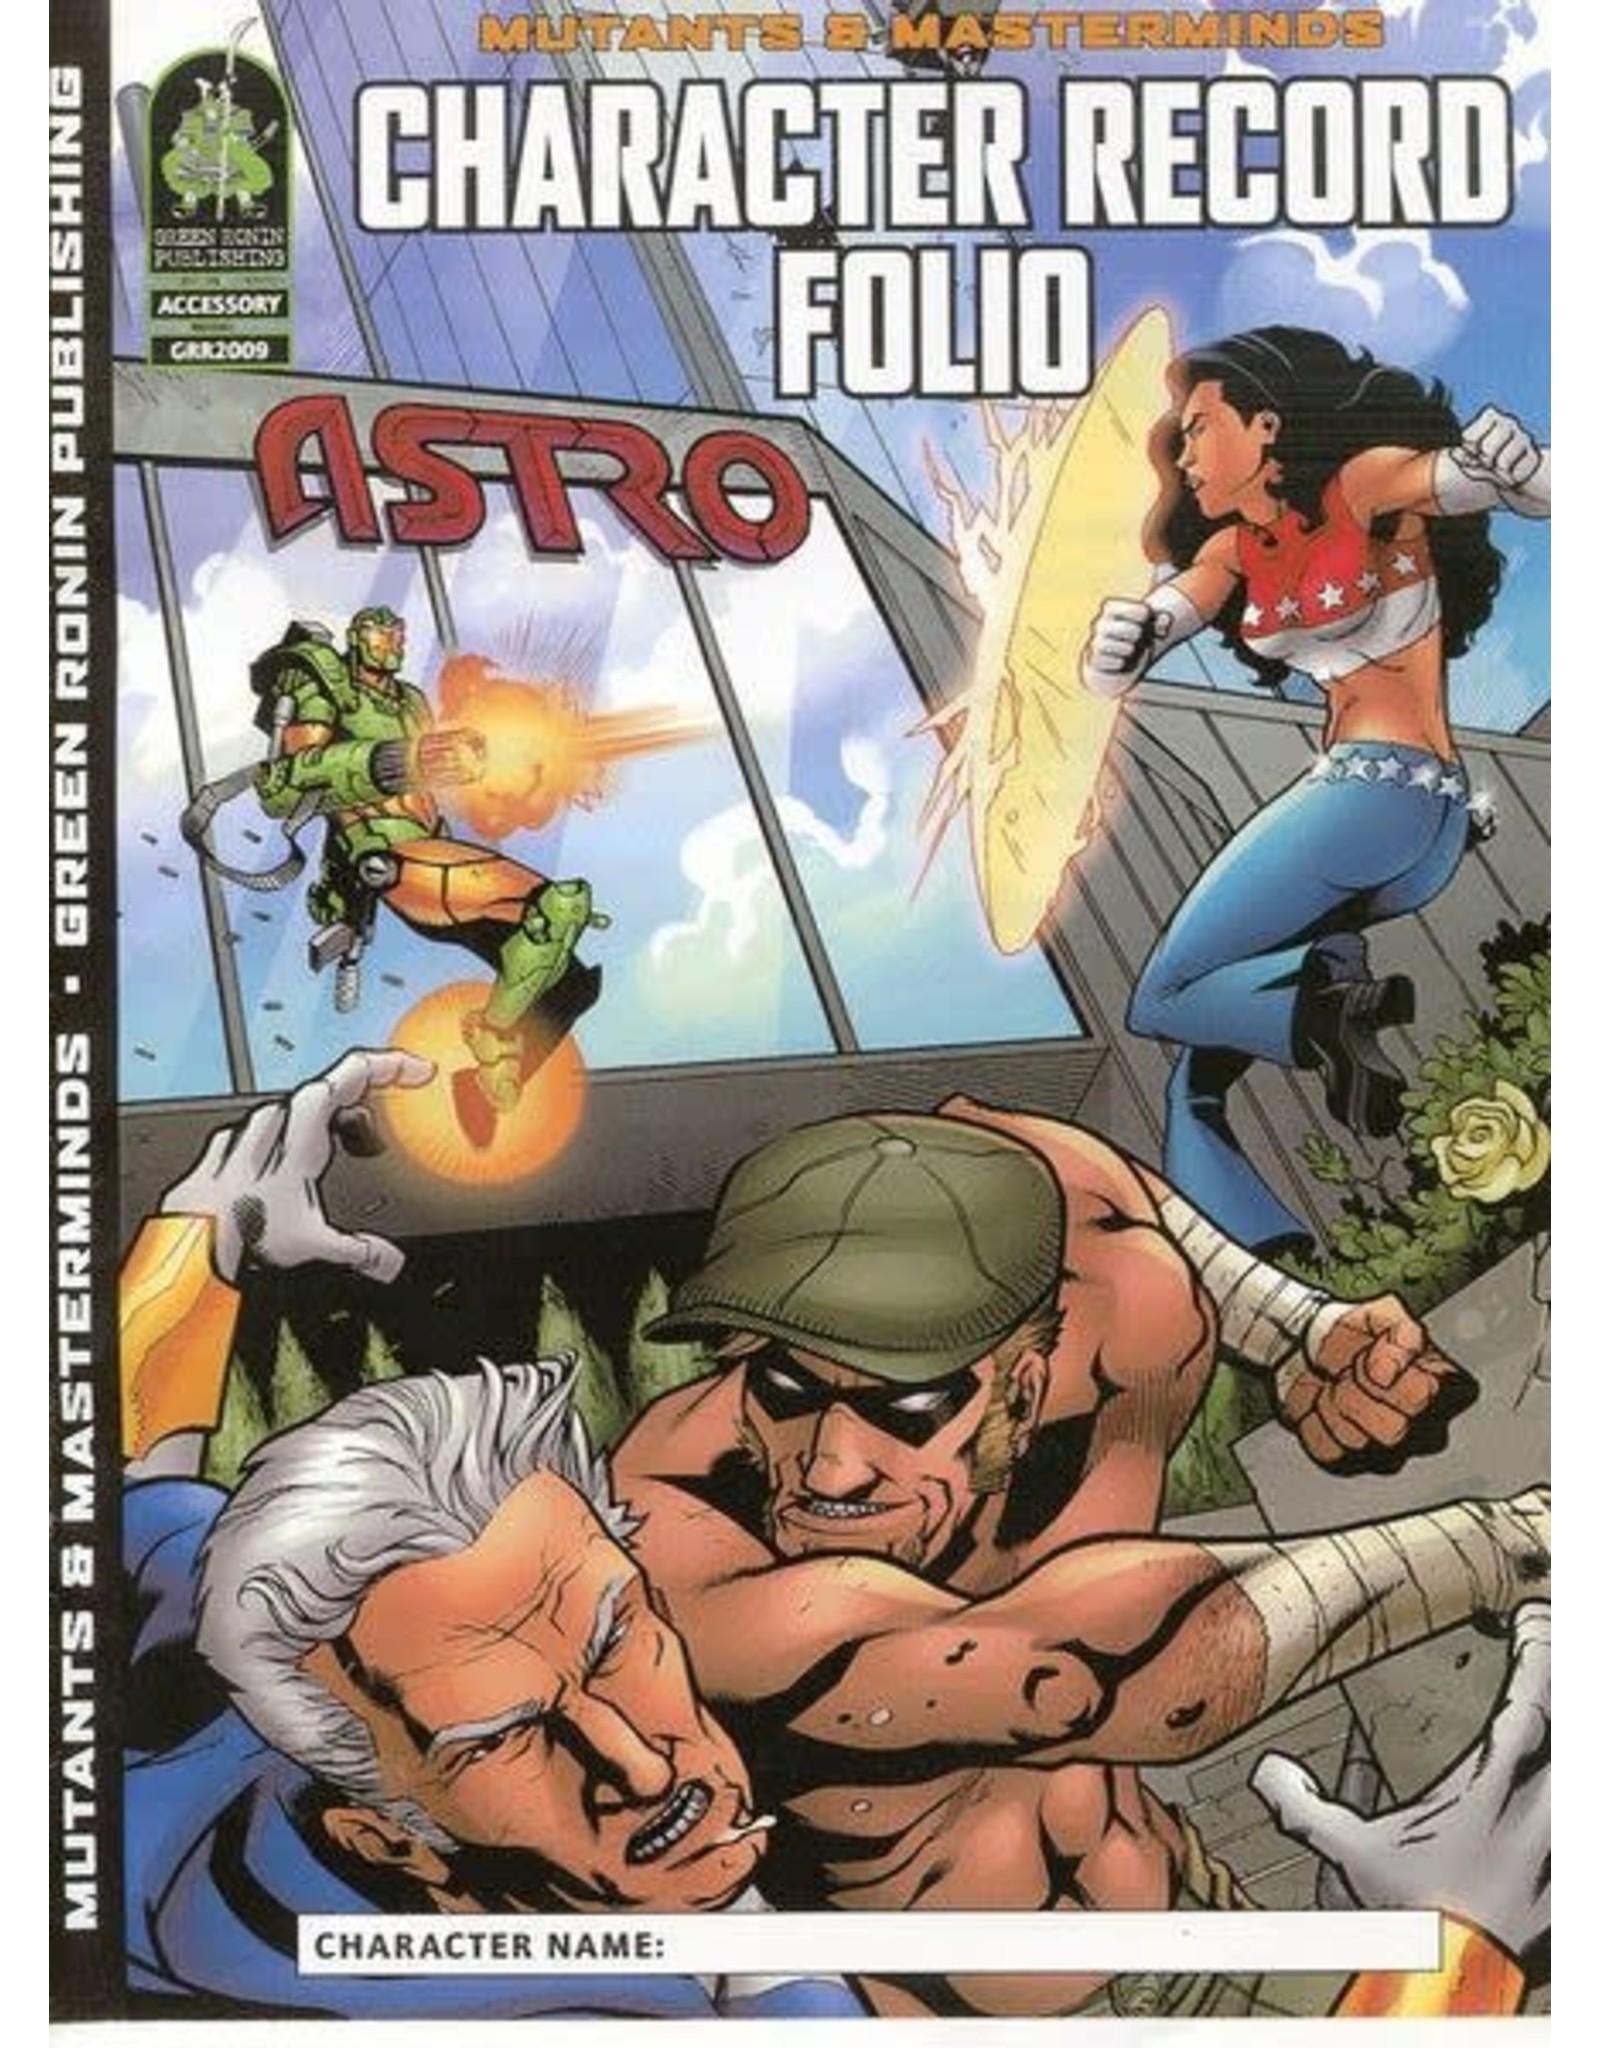 Green Ronin Publishing SALE - Mutants & Masterminds 1E: Character Record Folio